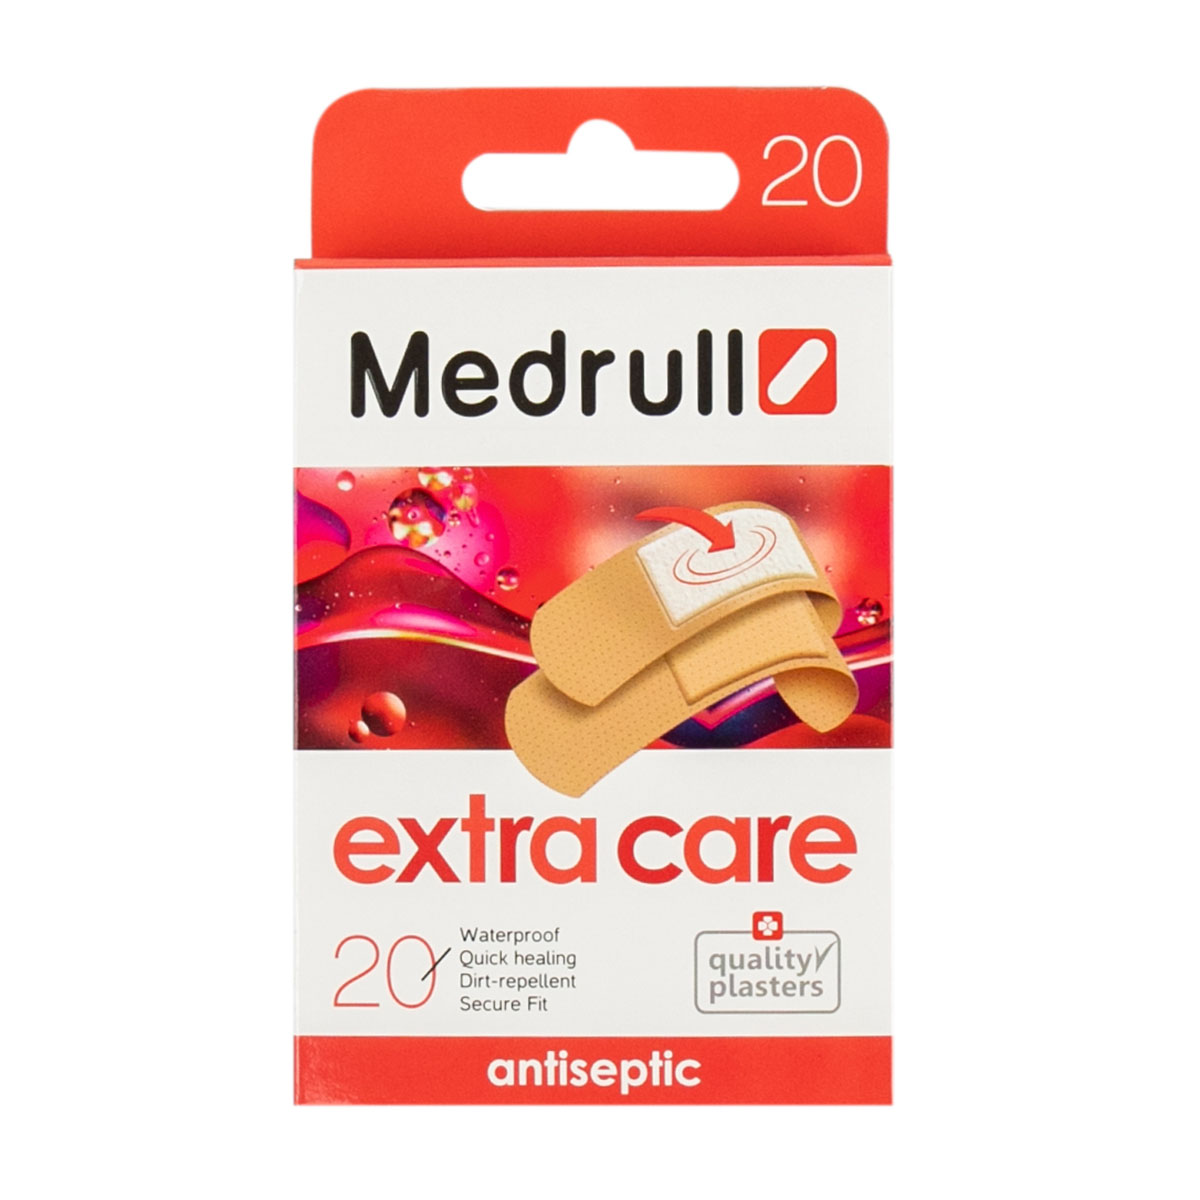 Medrull Extra Care No20